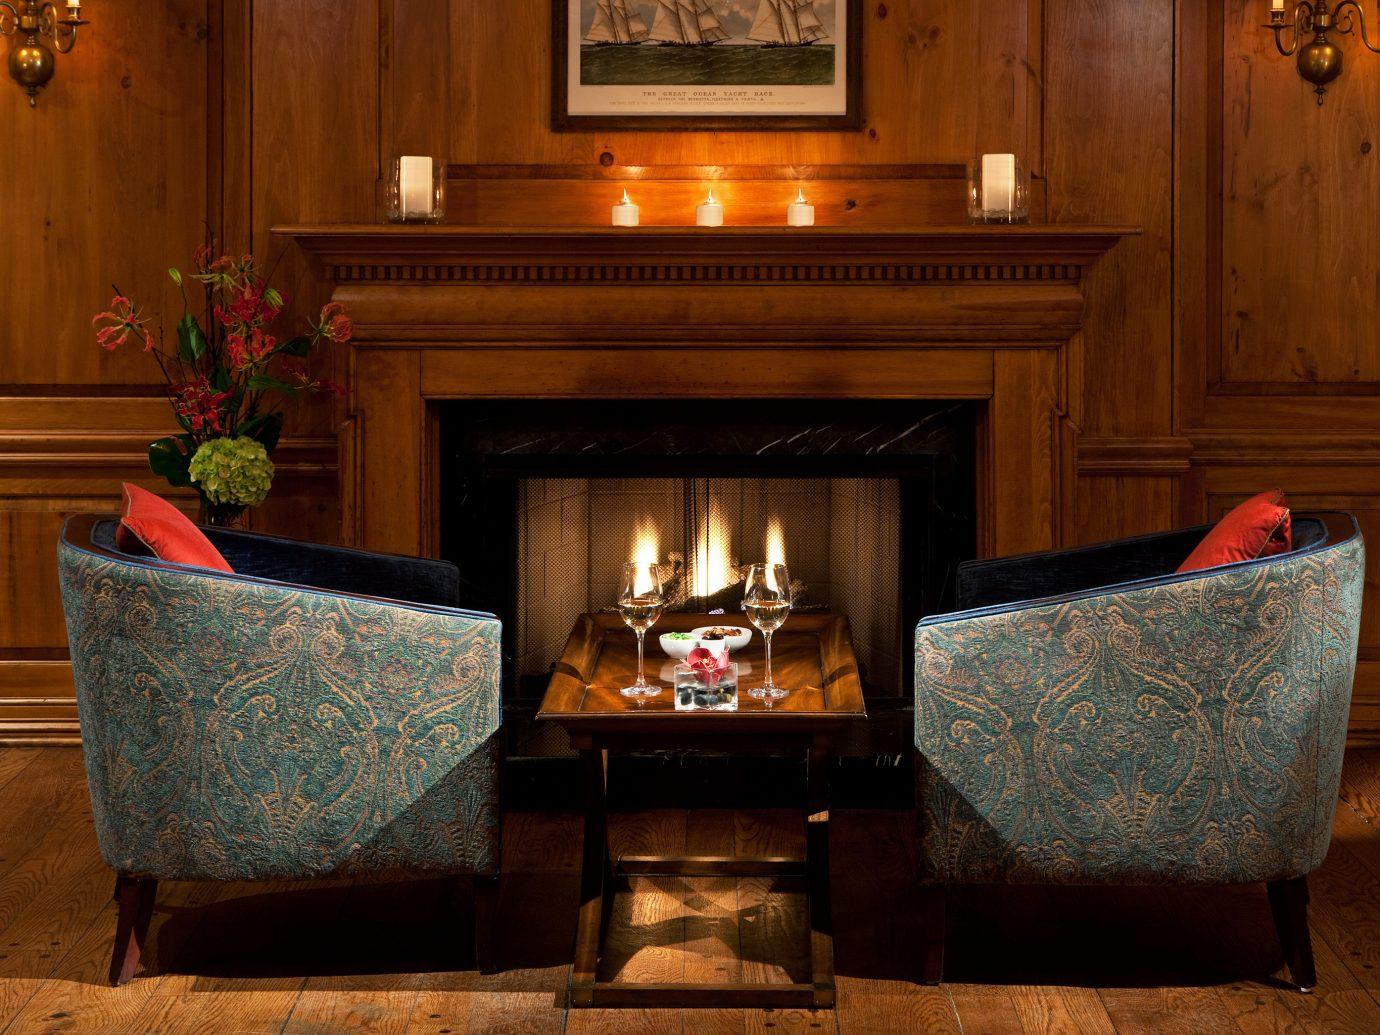 Hip Hotels Living Lounge Luxury Modern indoor floor Fireplace room hearth living room hardwood wood lighting interior design home estate wood flooring furniture